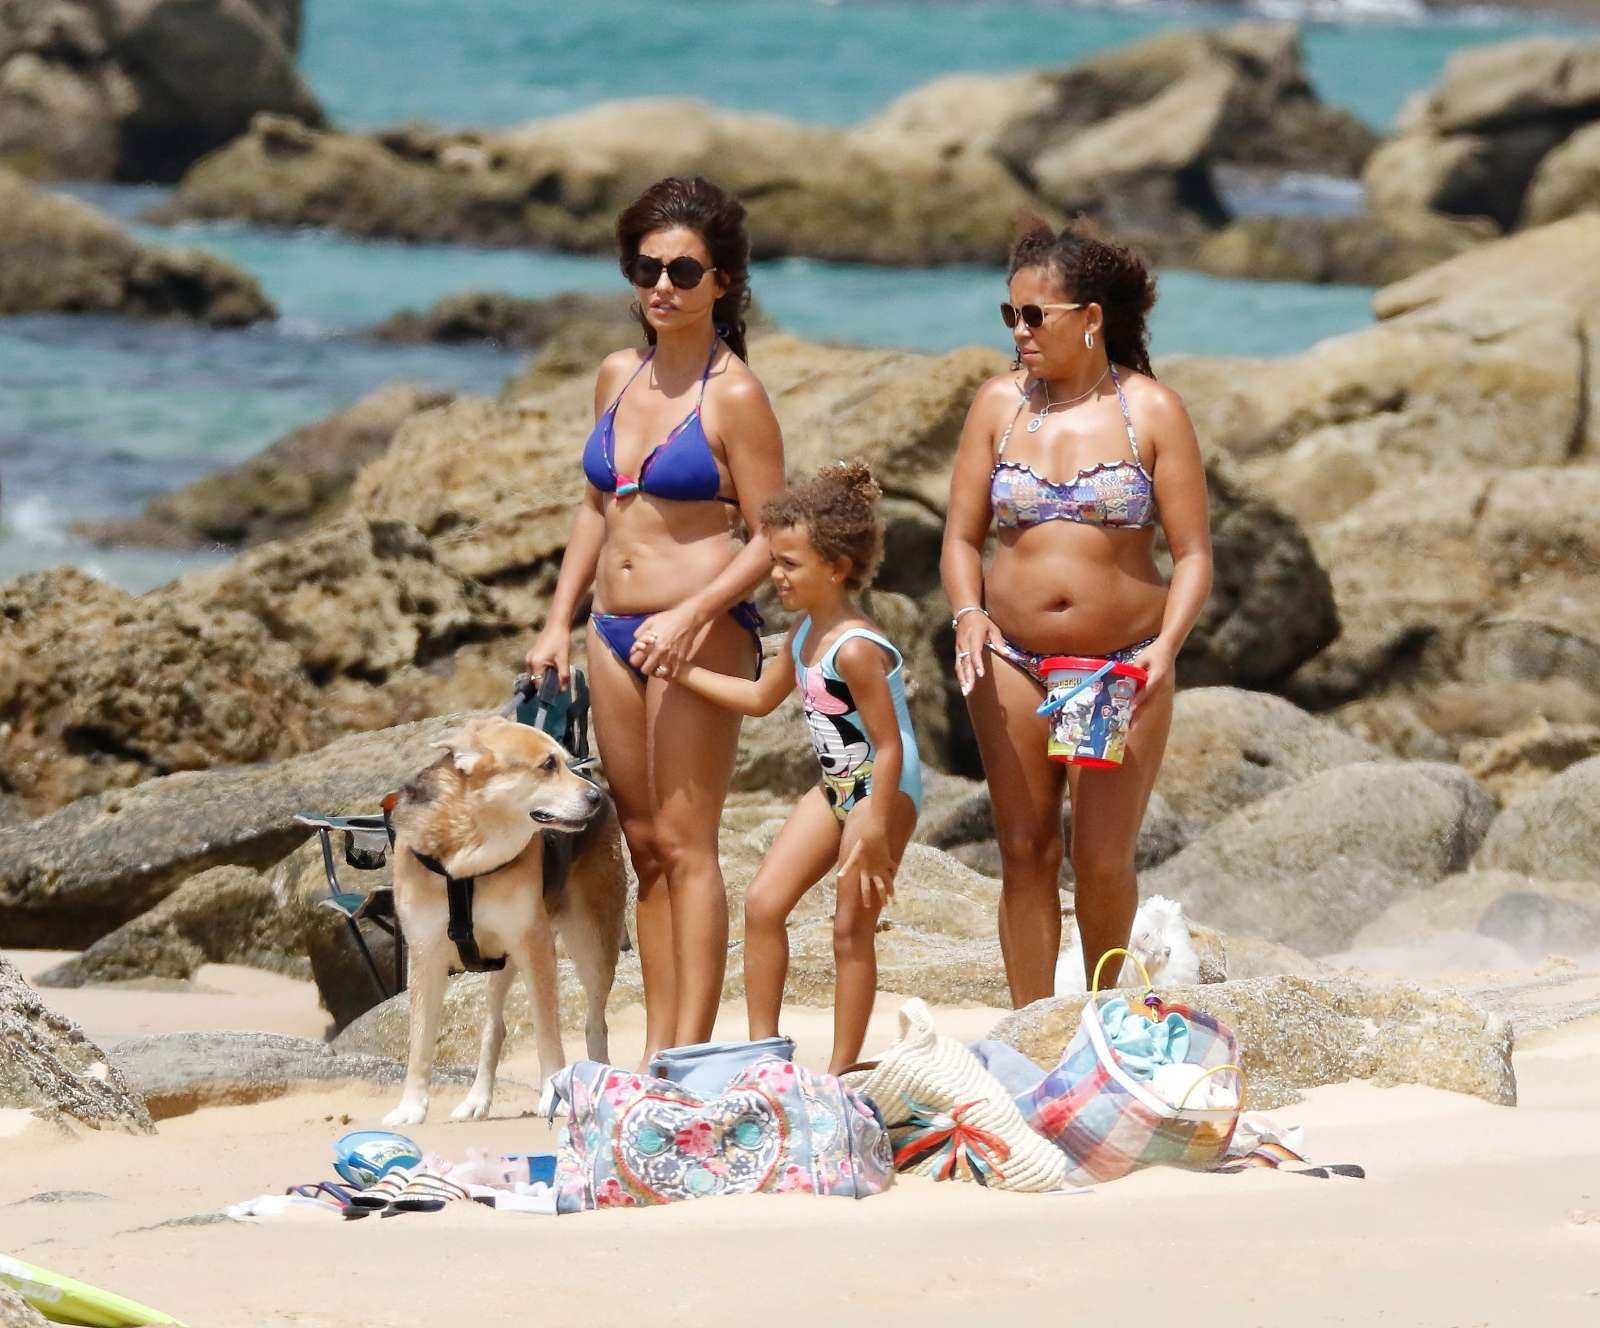 Monica Cruz 2017 : Monica Cruz in Bikini 2017 -37